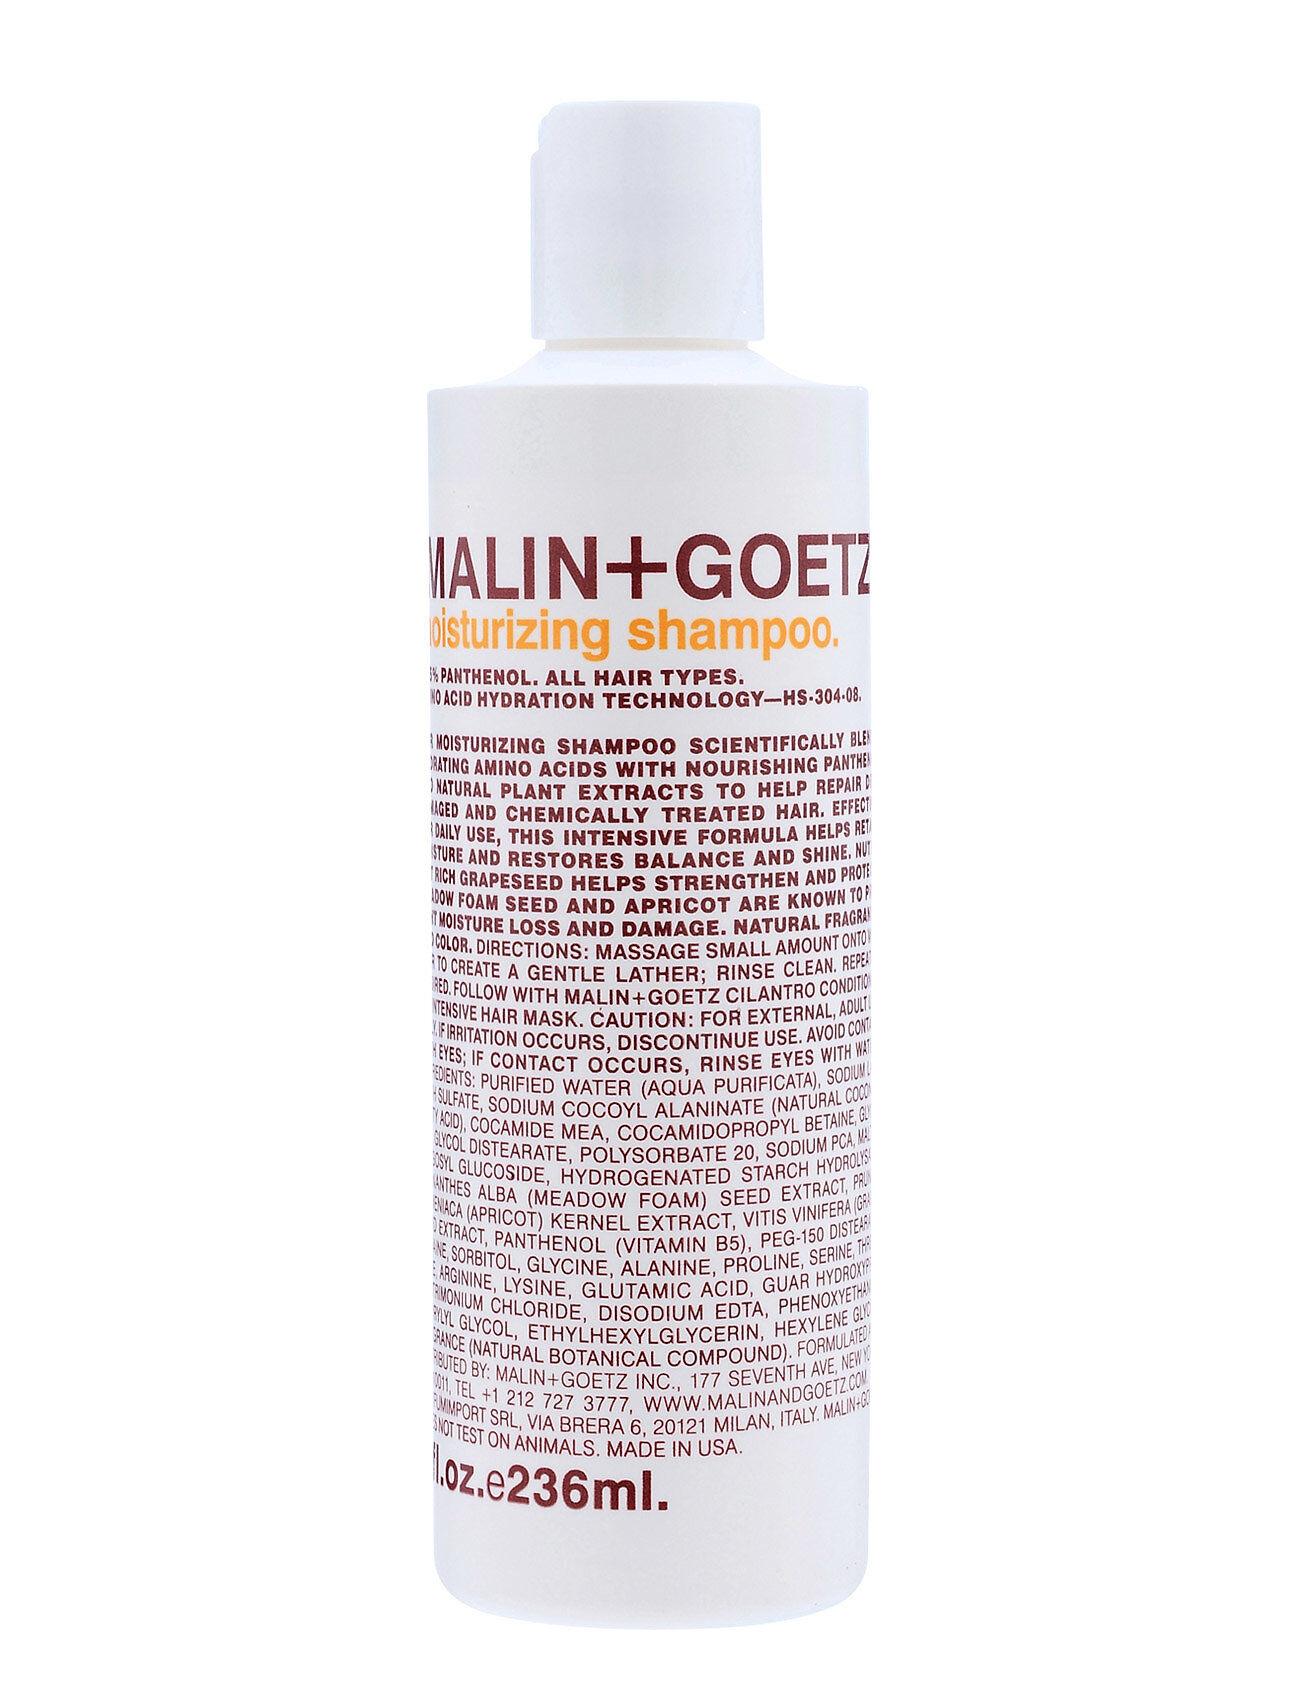 Malin+Goetz Moisturizing Shampoo